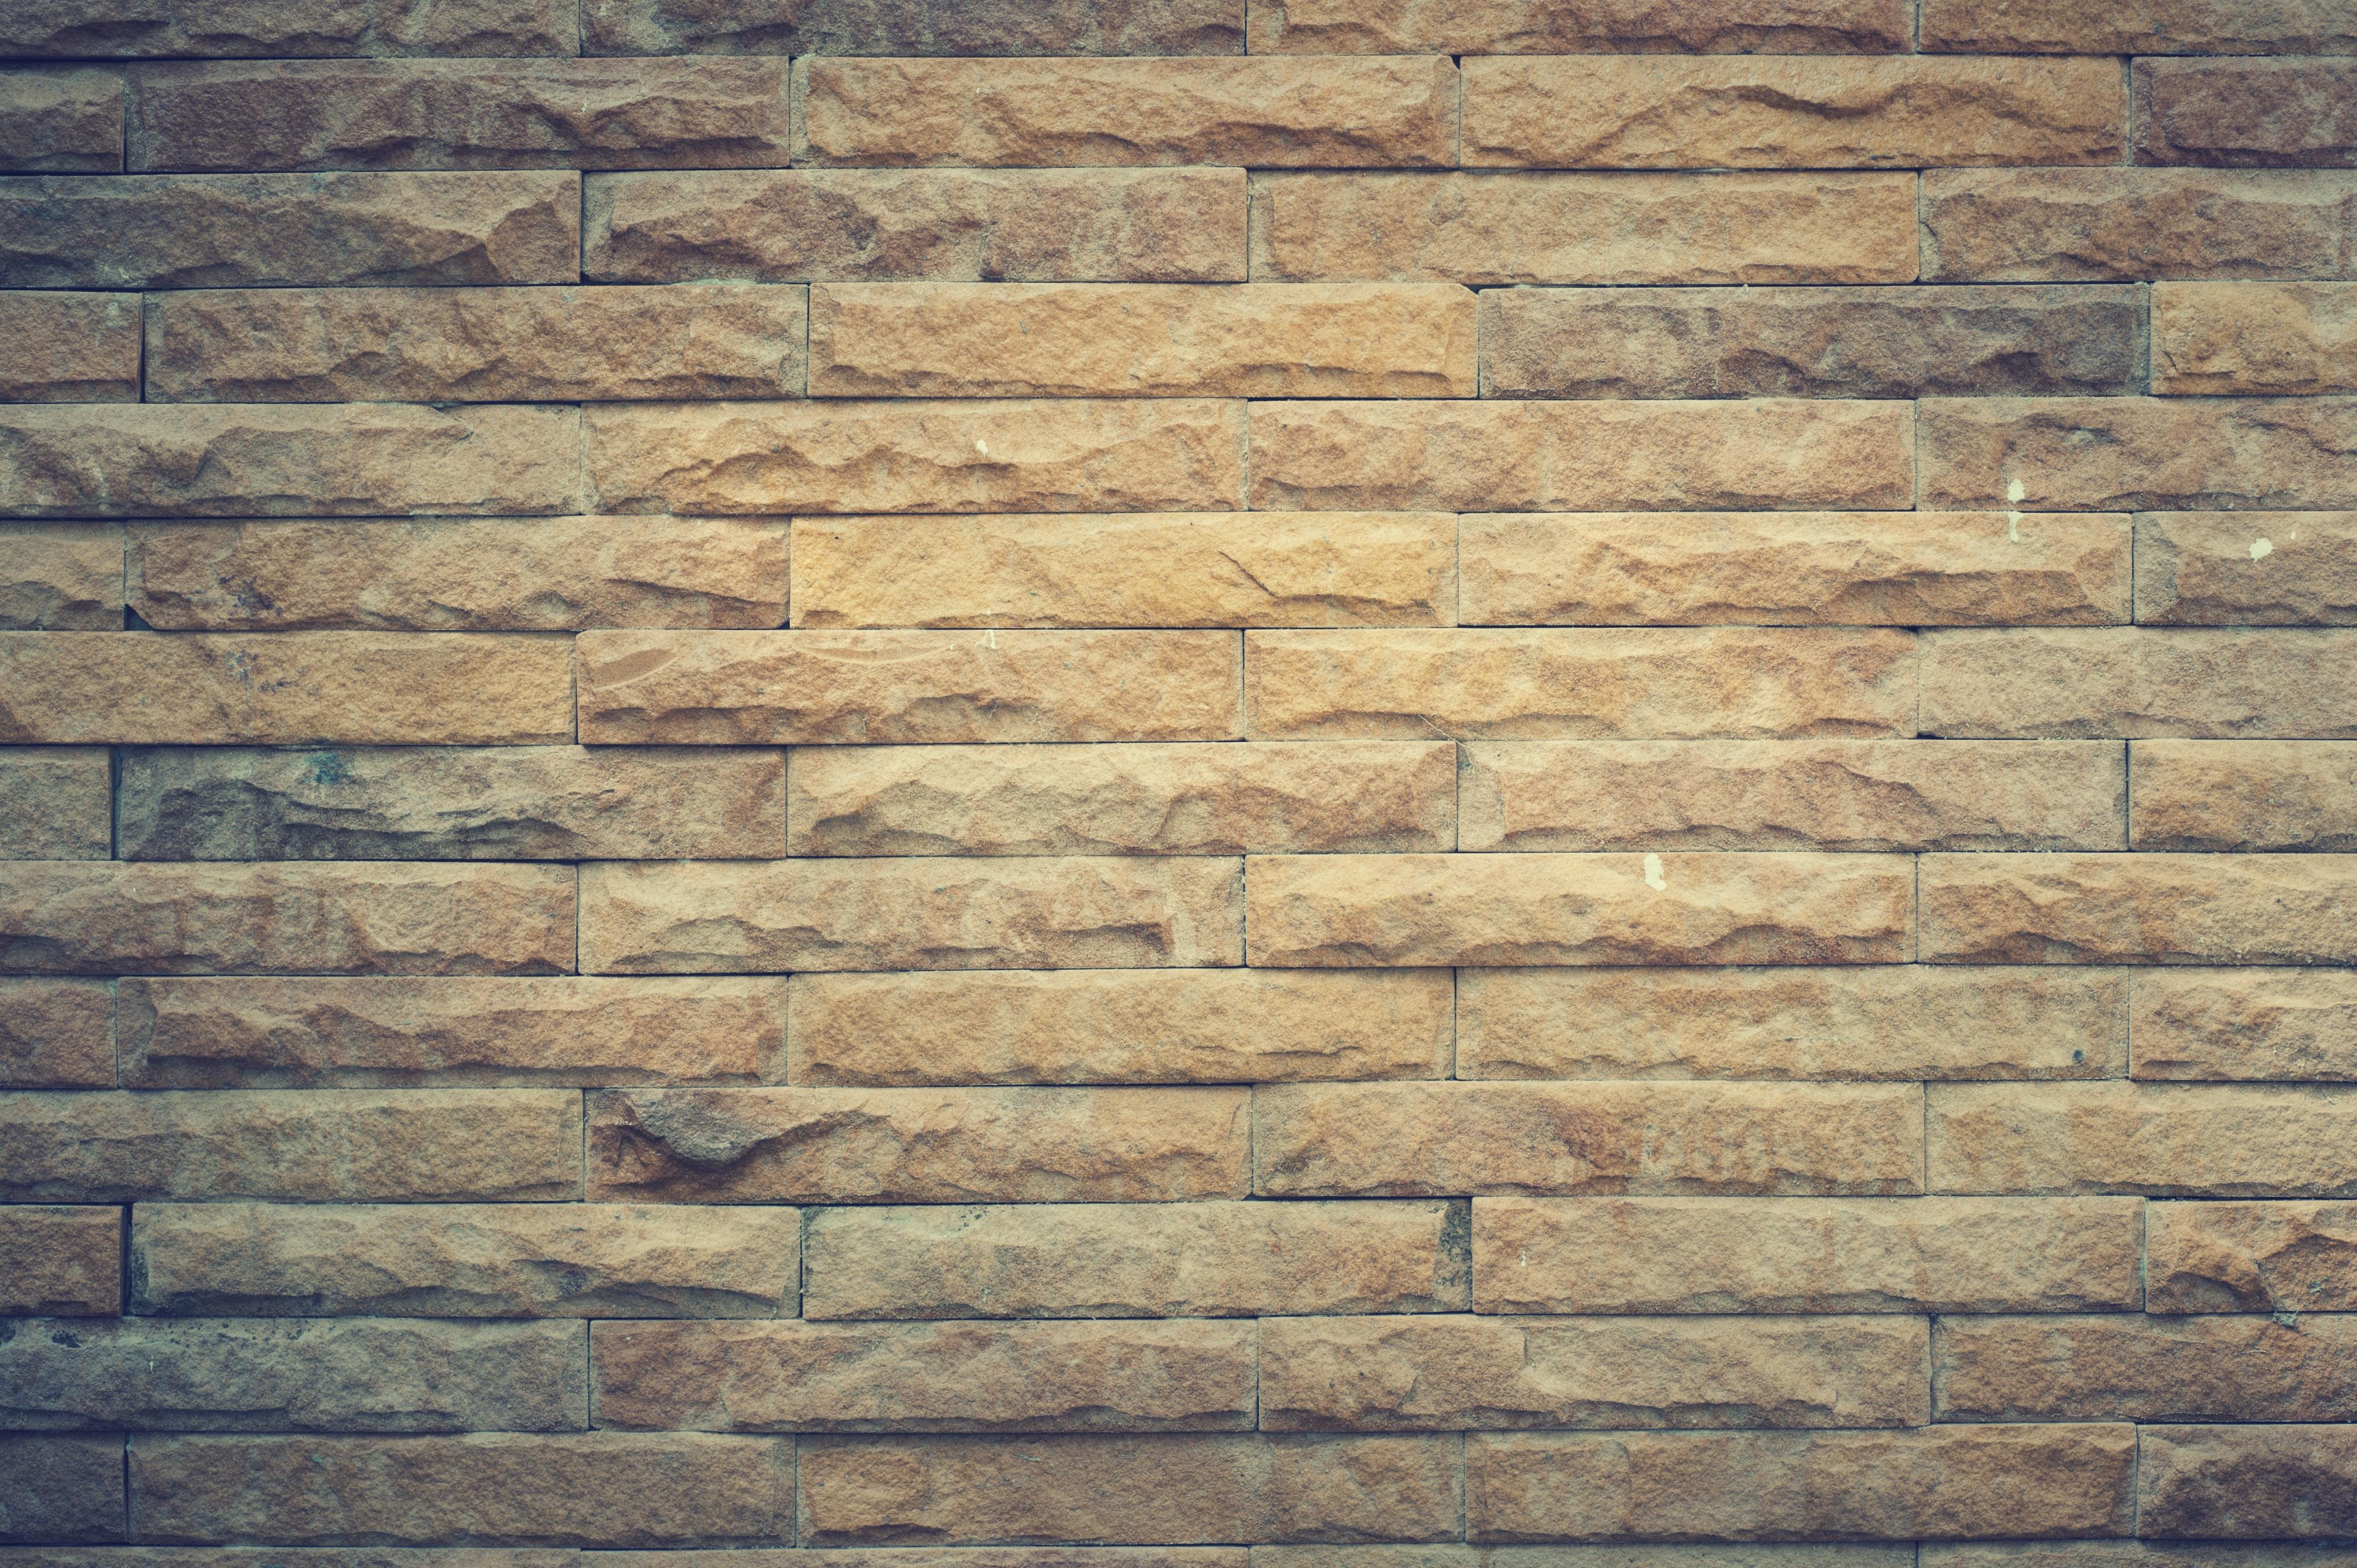 Yellow brick wall photo